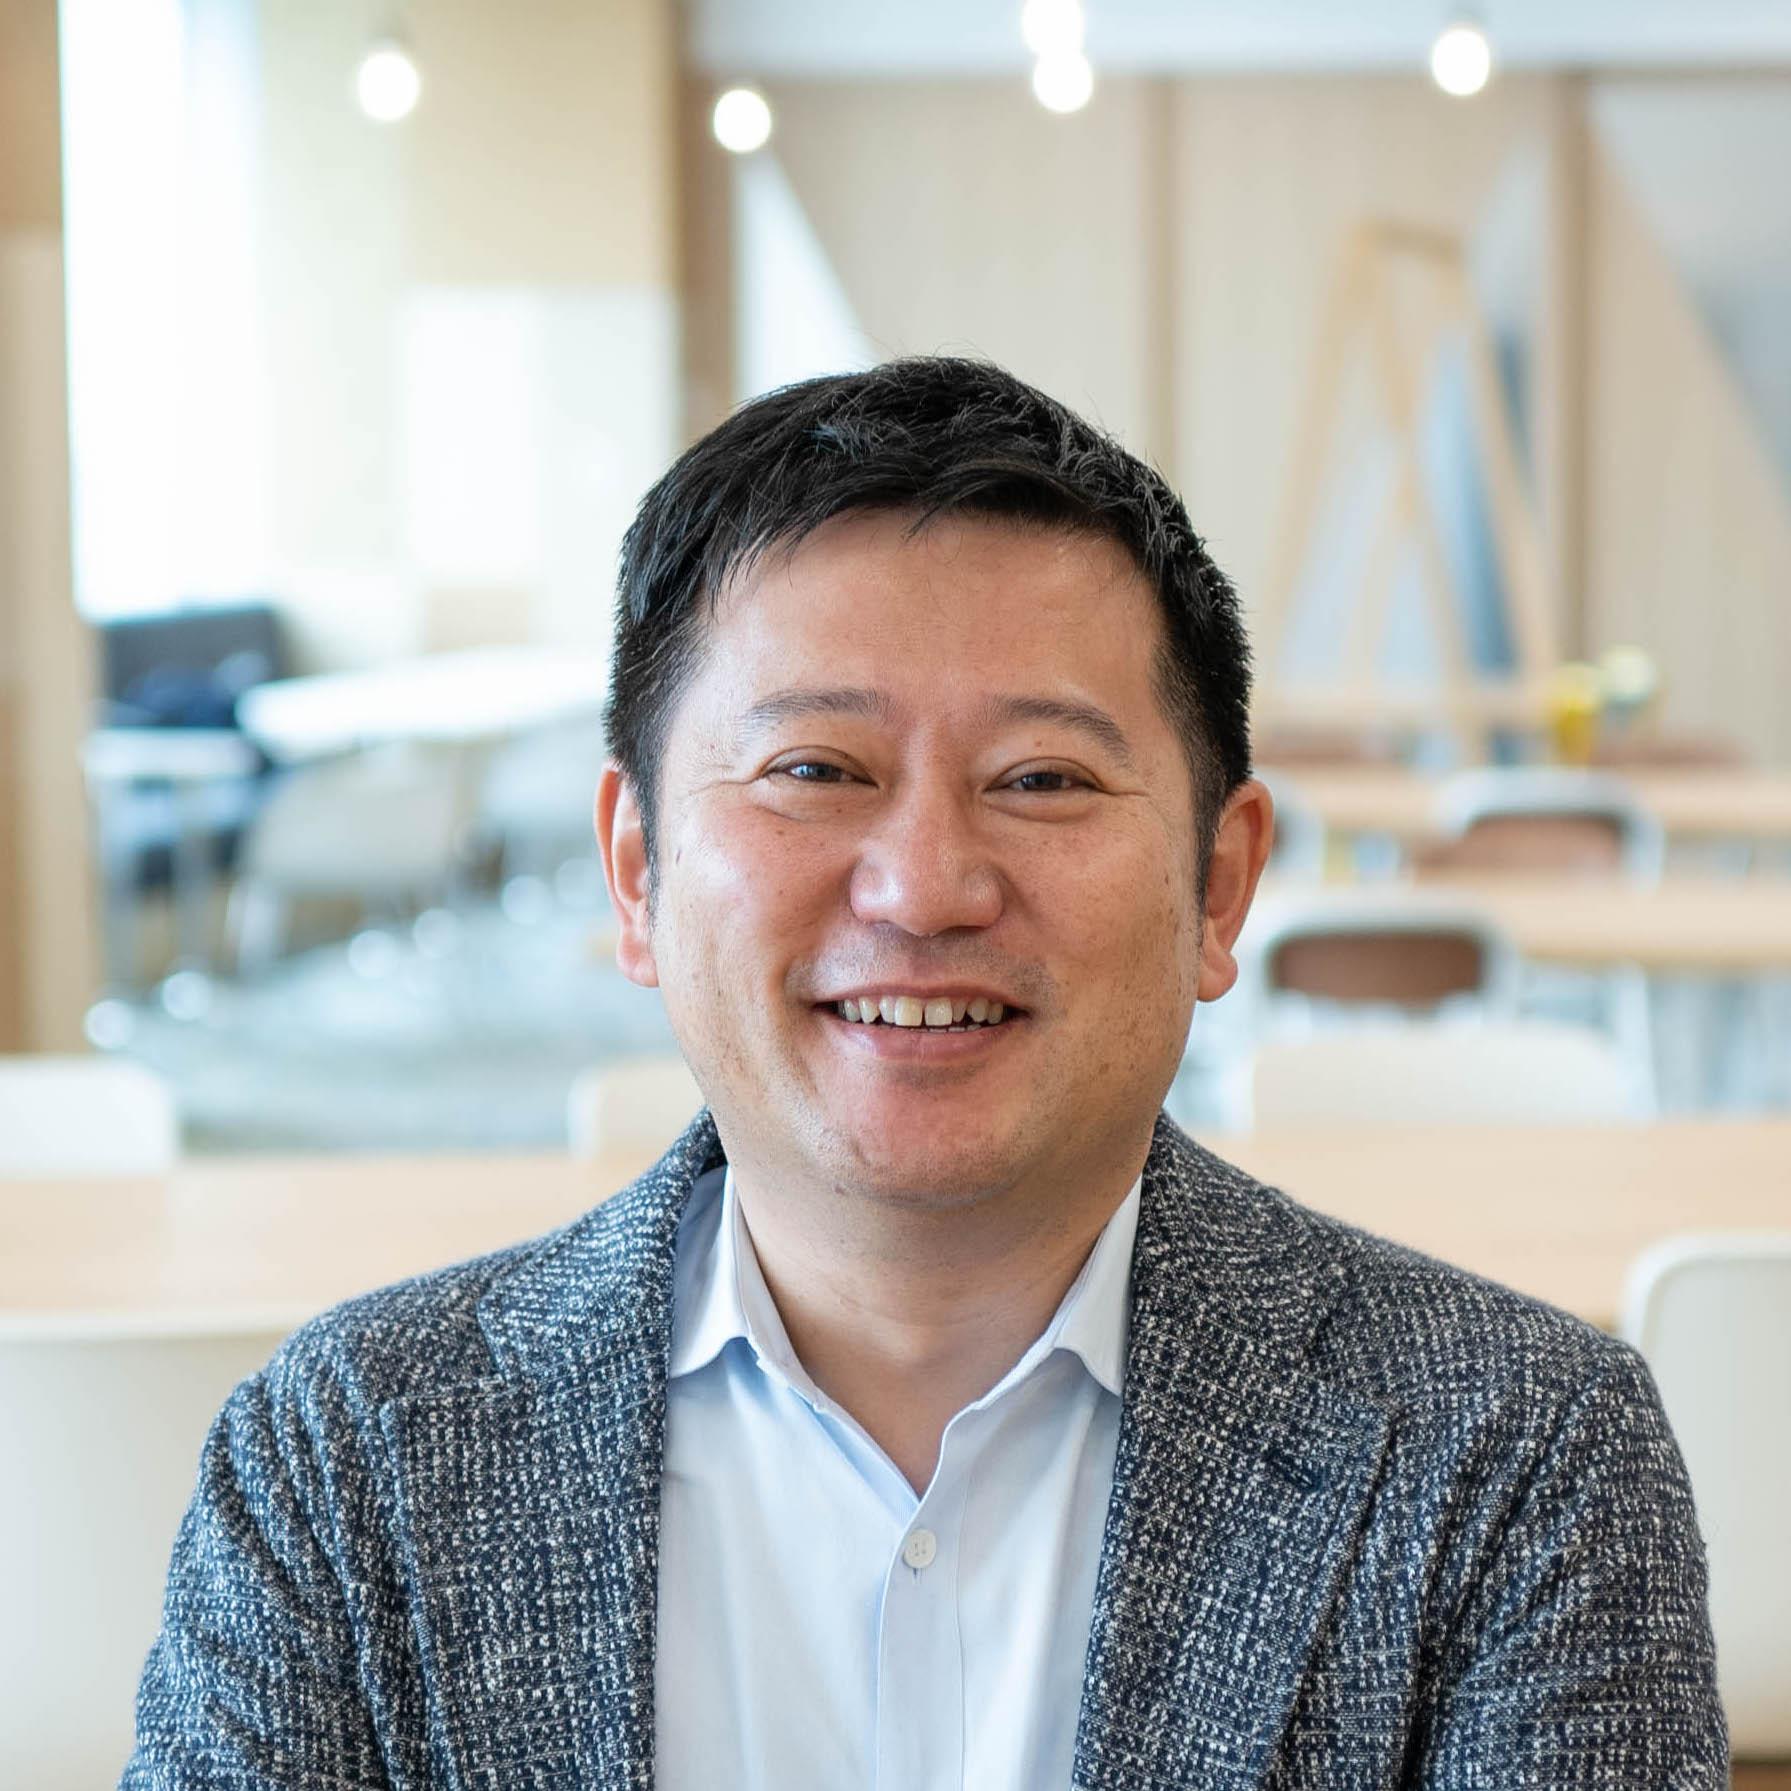 辻 庸介 氏 | 株式会社マネーフォワード 代表取締役社長CEO